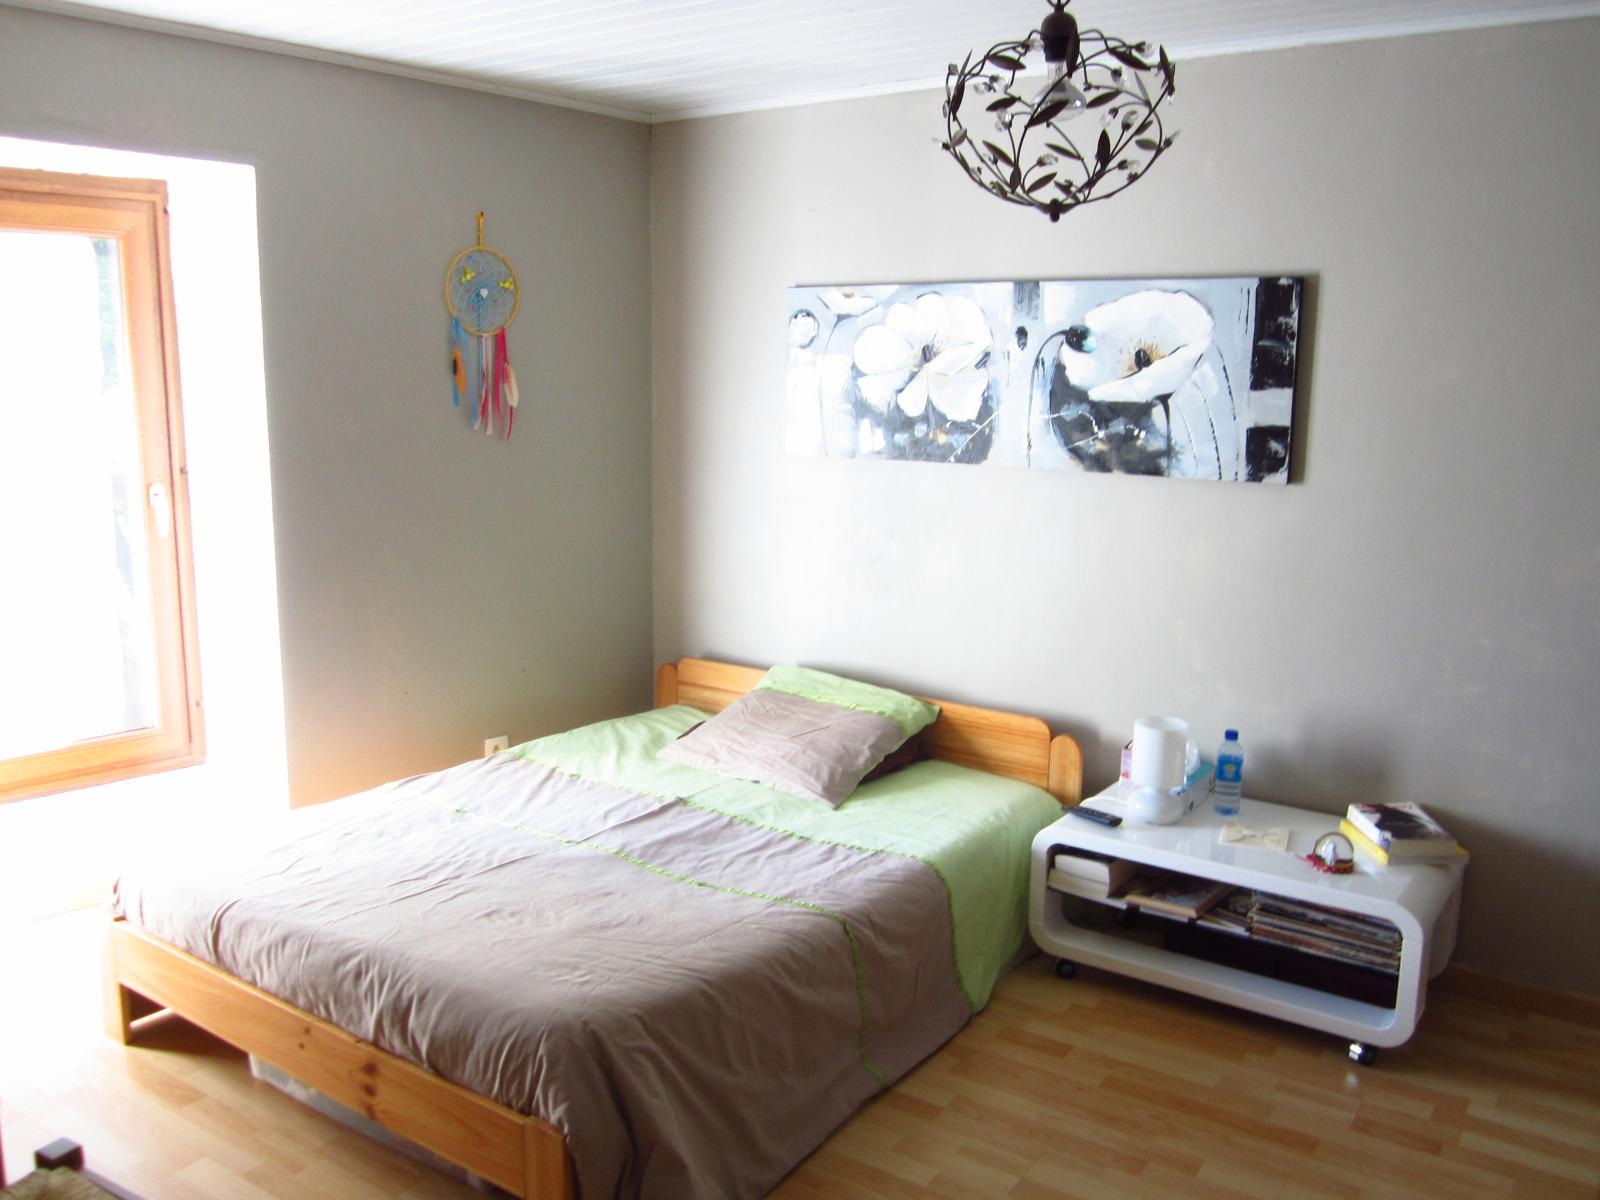 EXCLUSIVITE Viry Appartement T4 de 94 m² à prix imbattable...